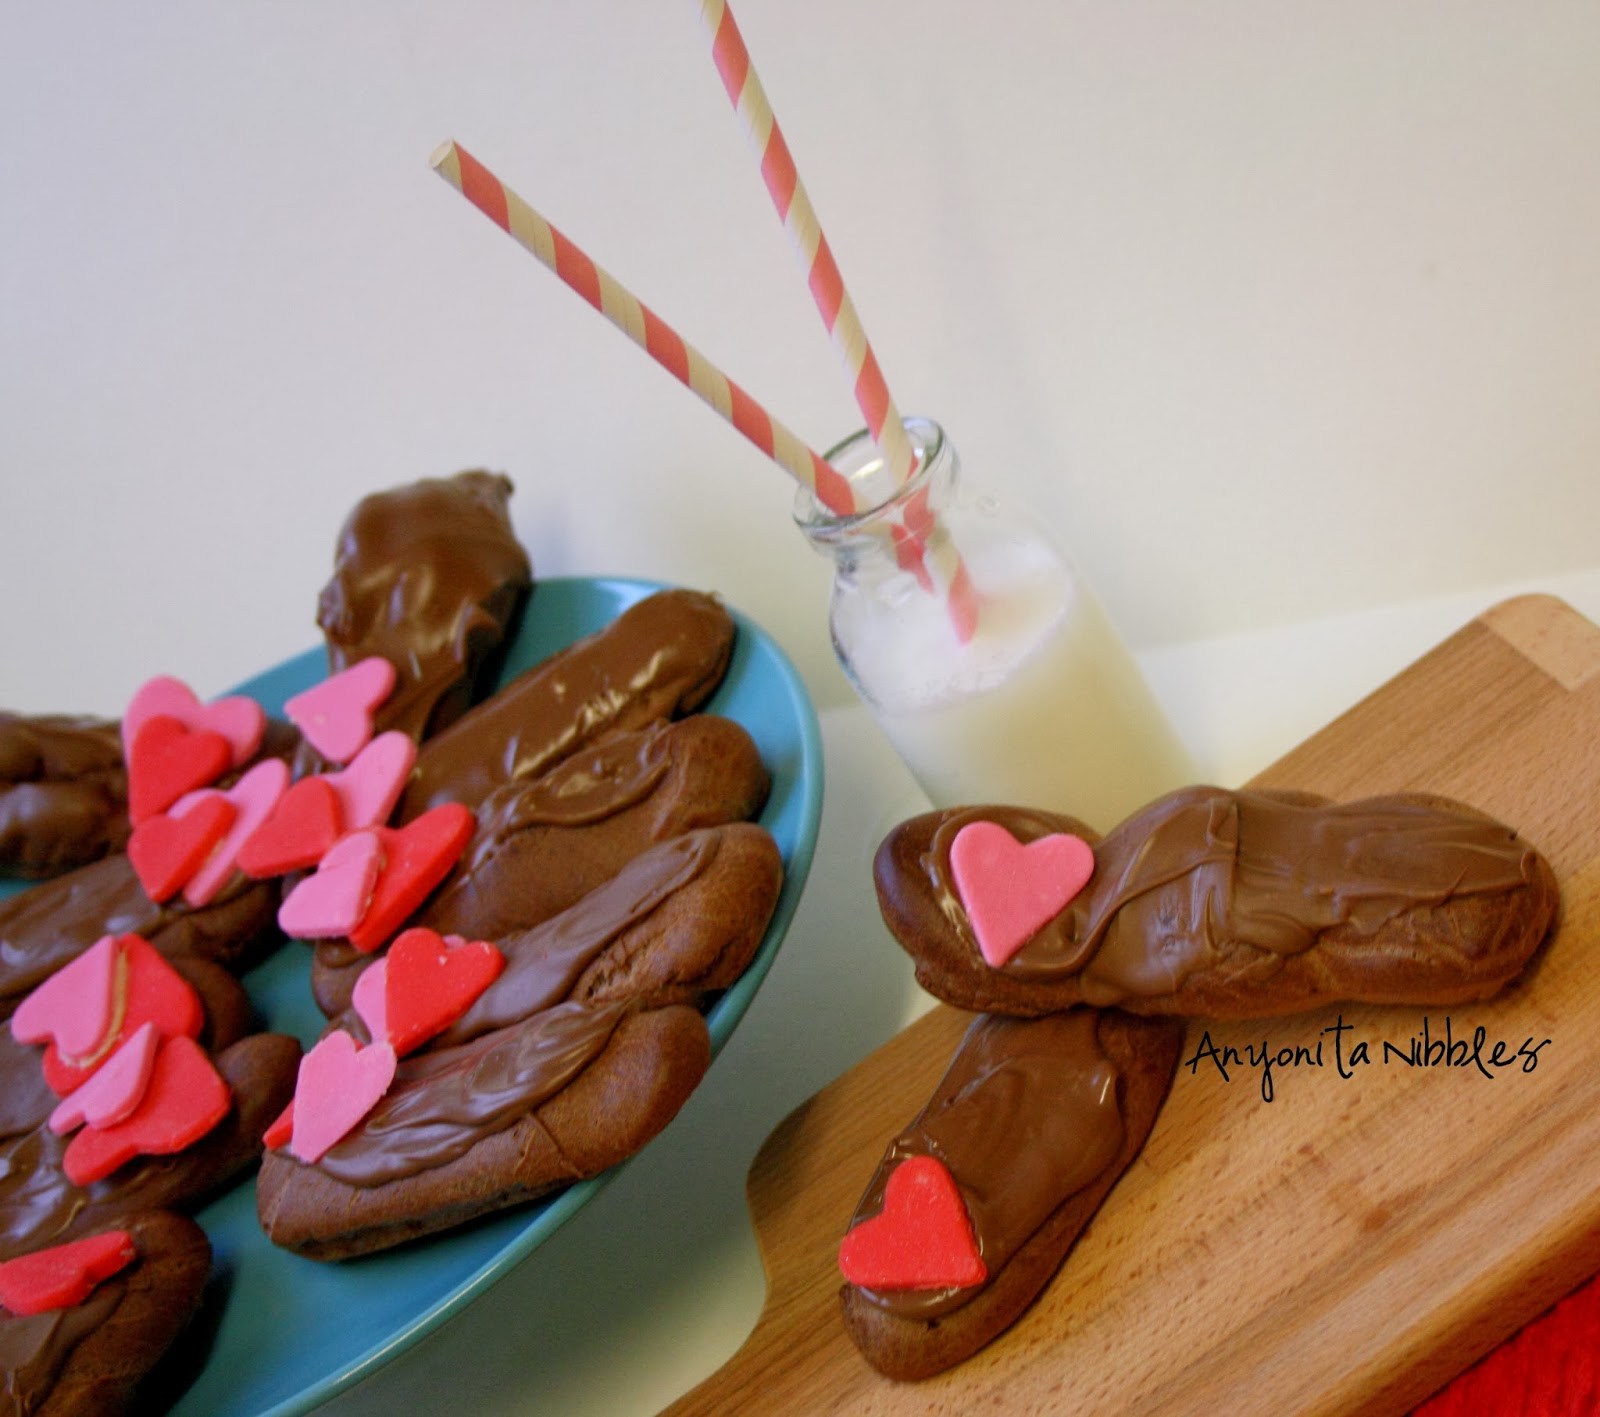 Triple chocolate eclairs with Nutella mascarpone cream, fondant hearts and milk